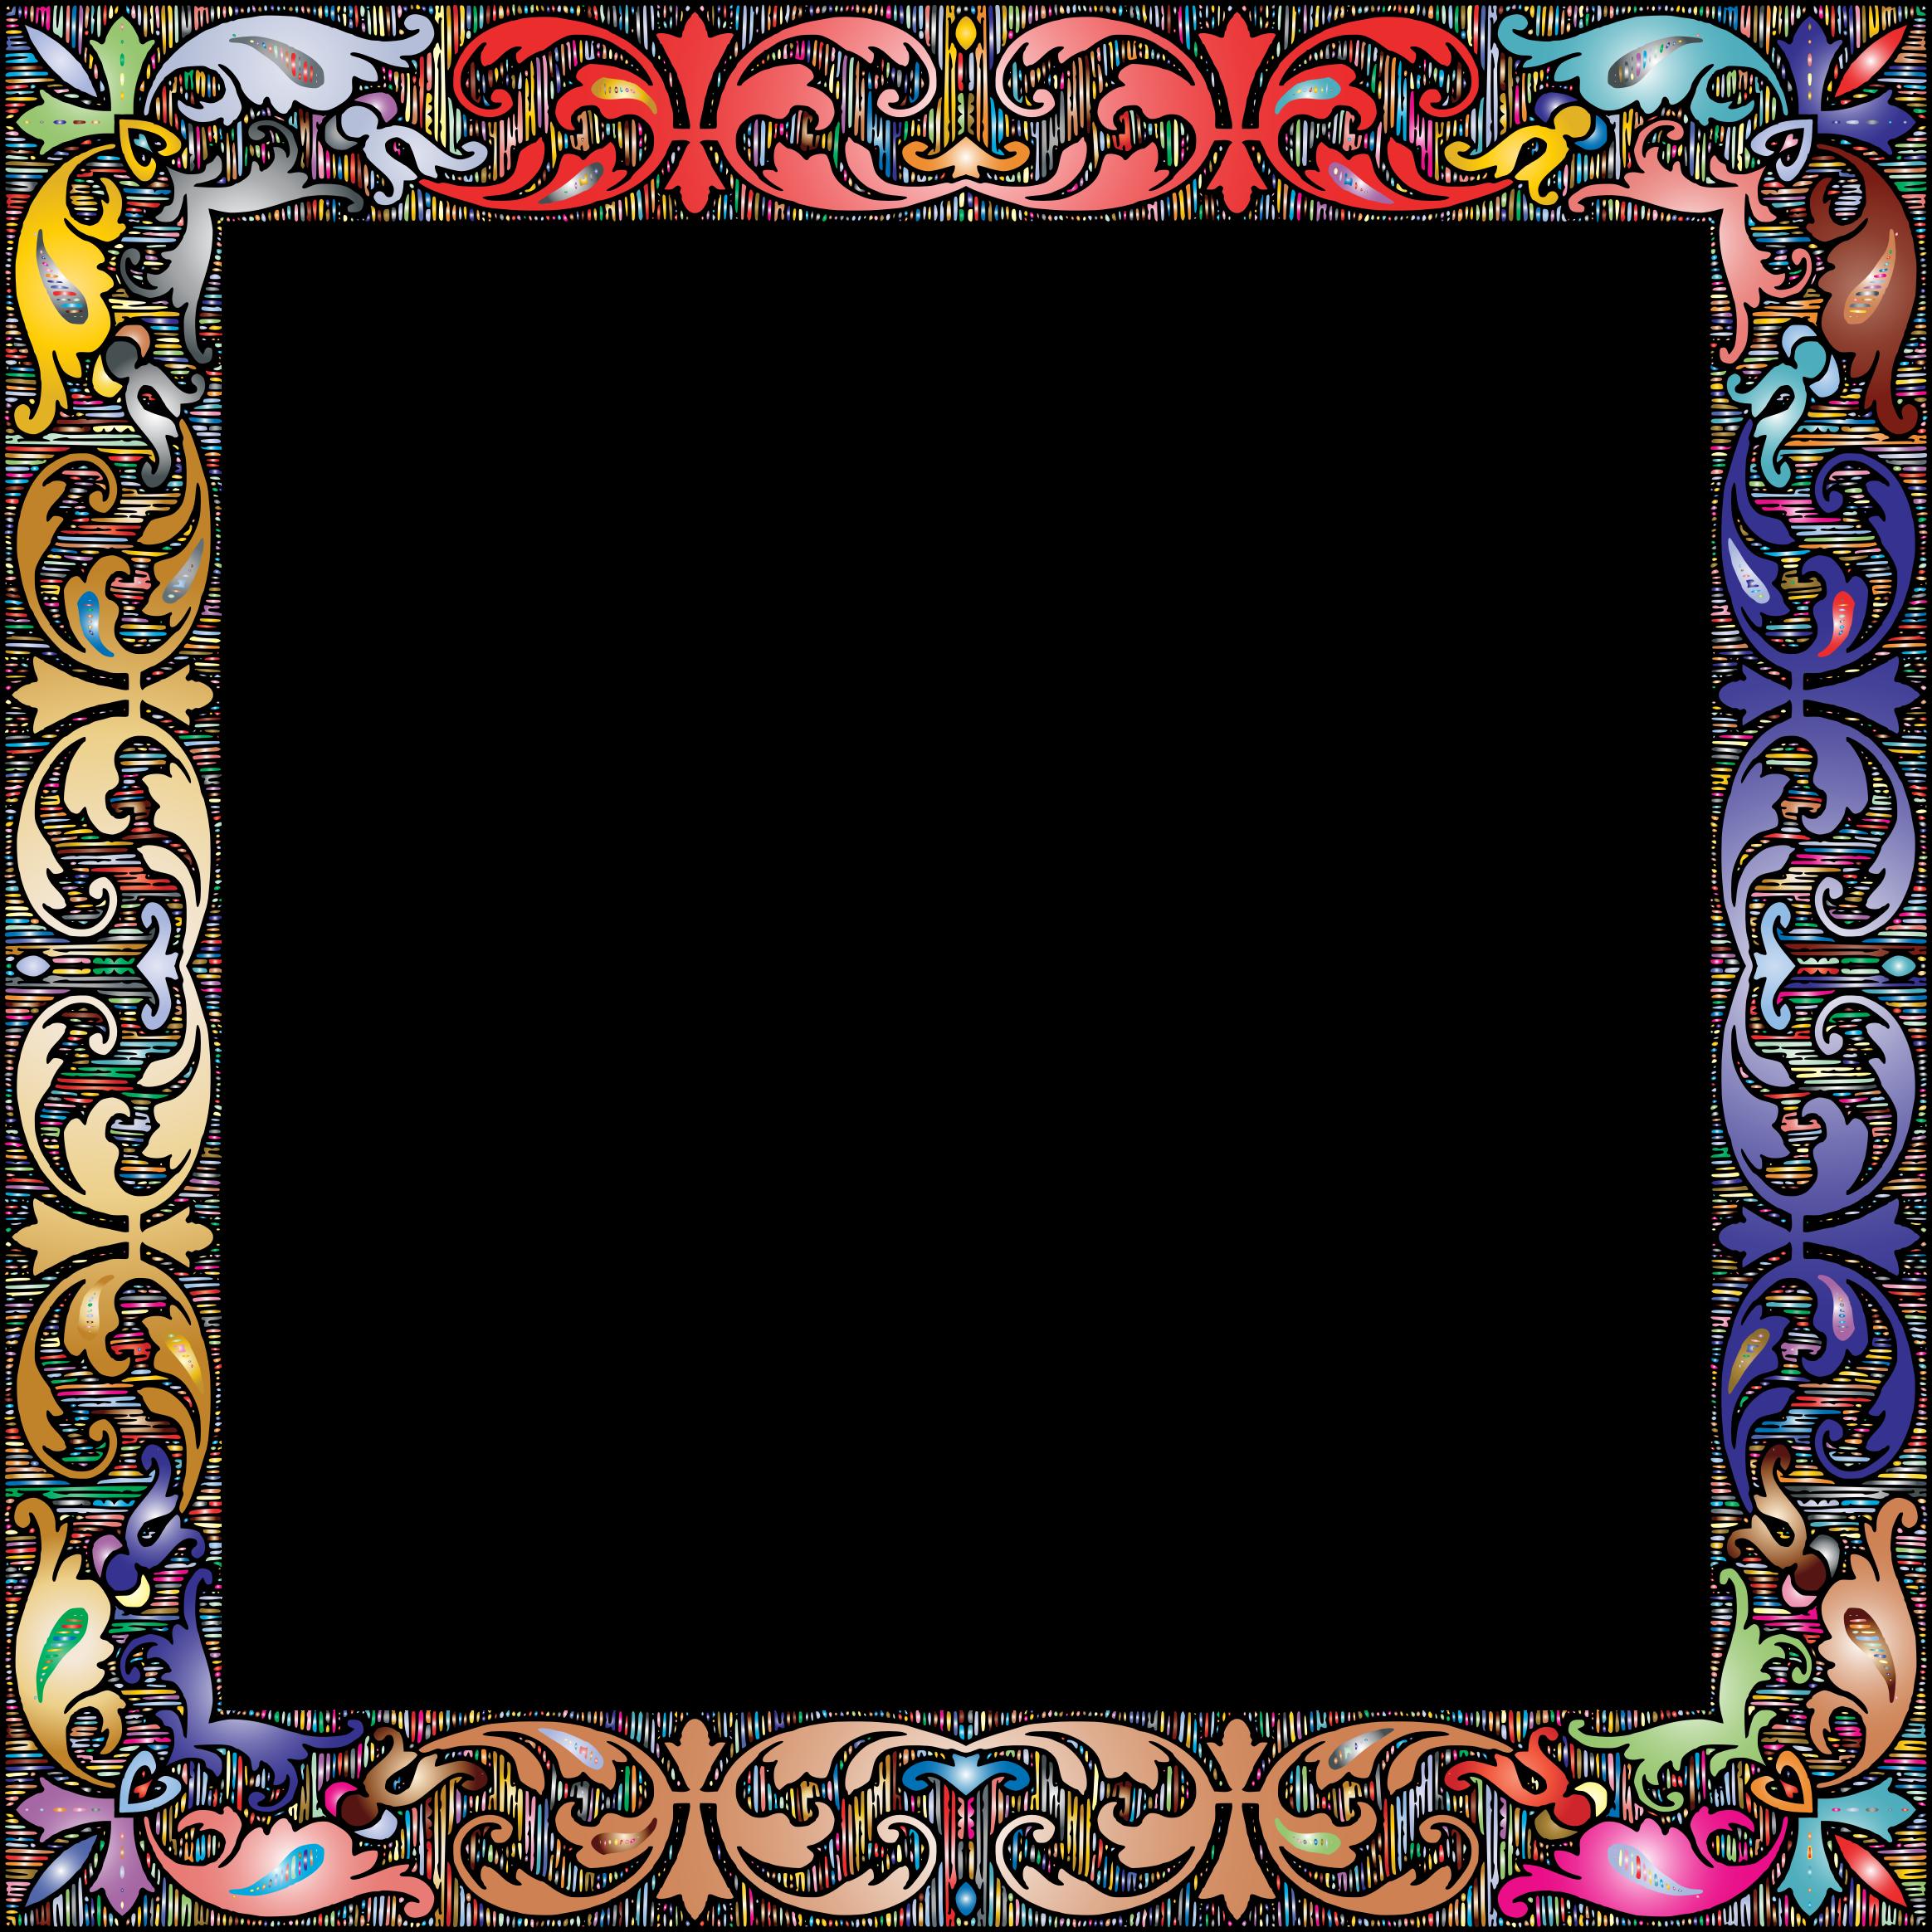 Clipart - Fancy Vintage Square Frame 2 Prismatic